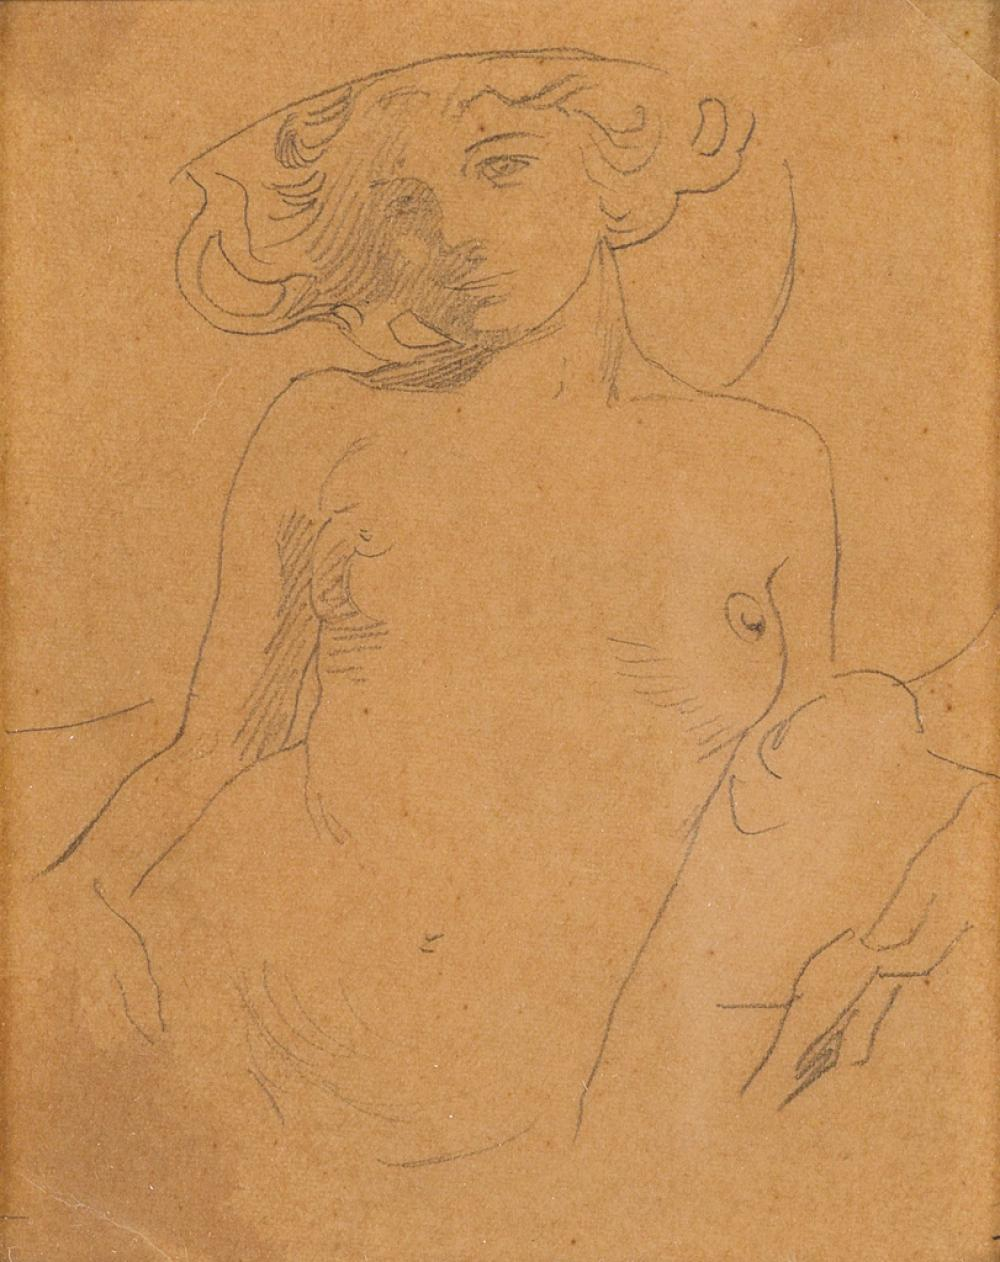 ALPHONSE MUCHA (1860-1939). [FIGURES DÉCORATIFS.] Preparatory pencil sketch. Circa 1905. 5x4 inches, 14x12 cm.